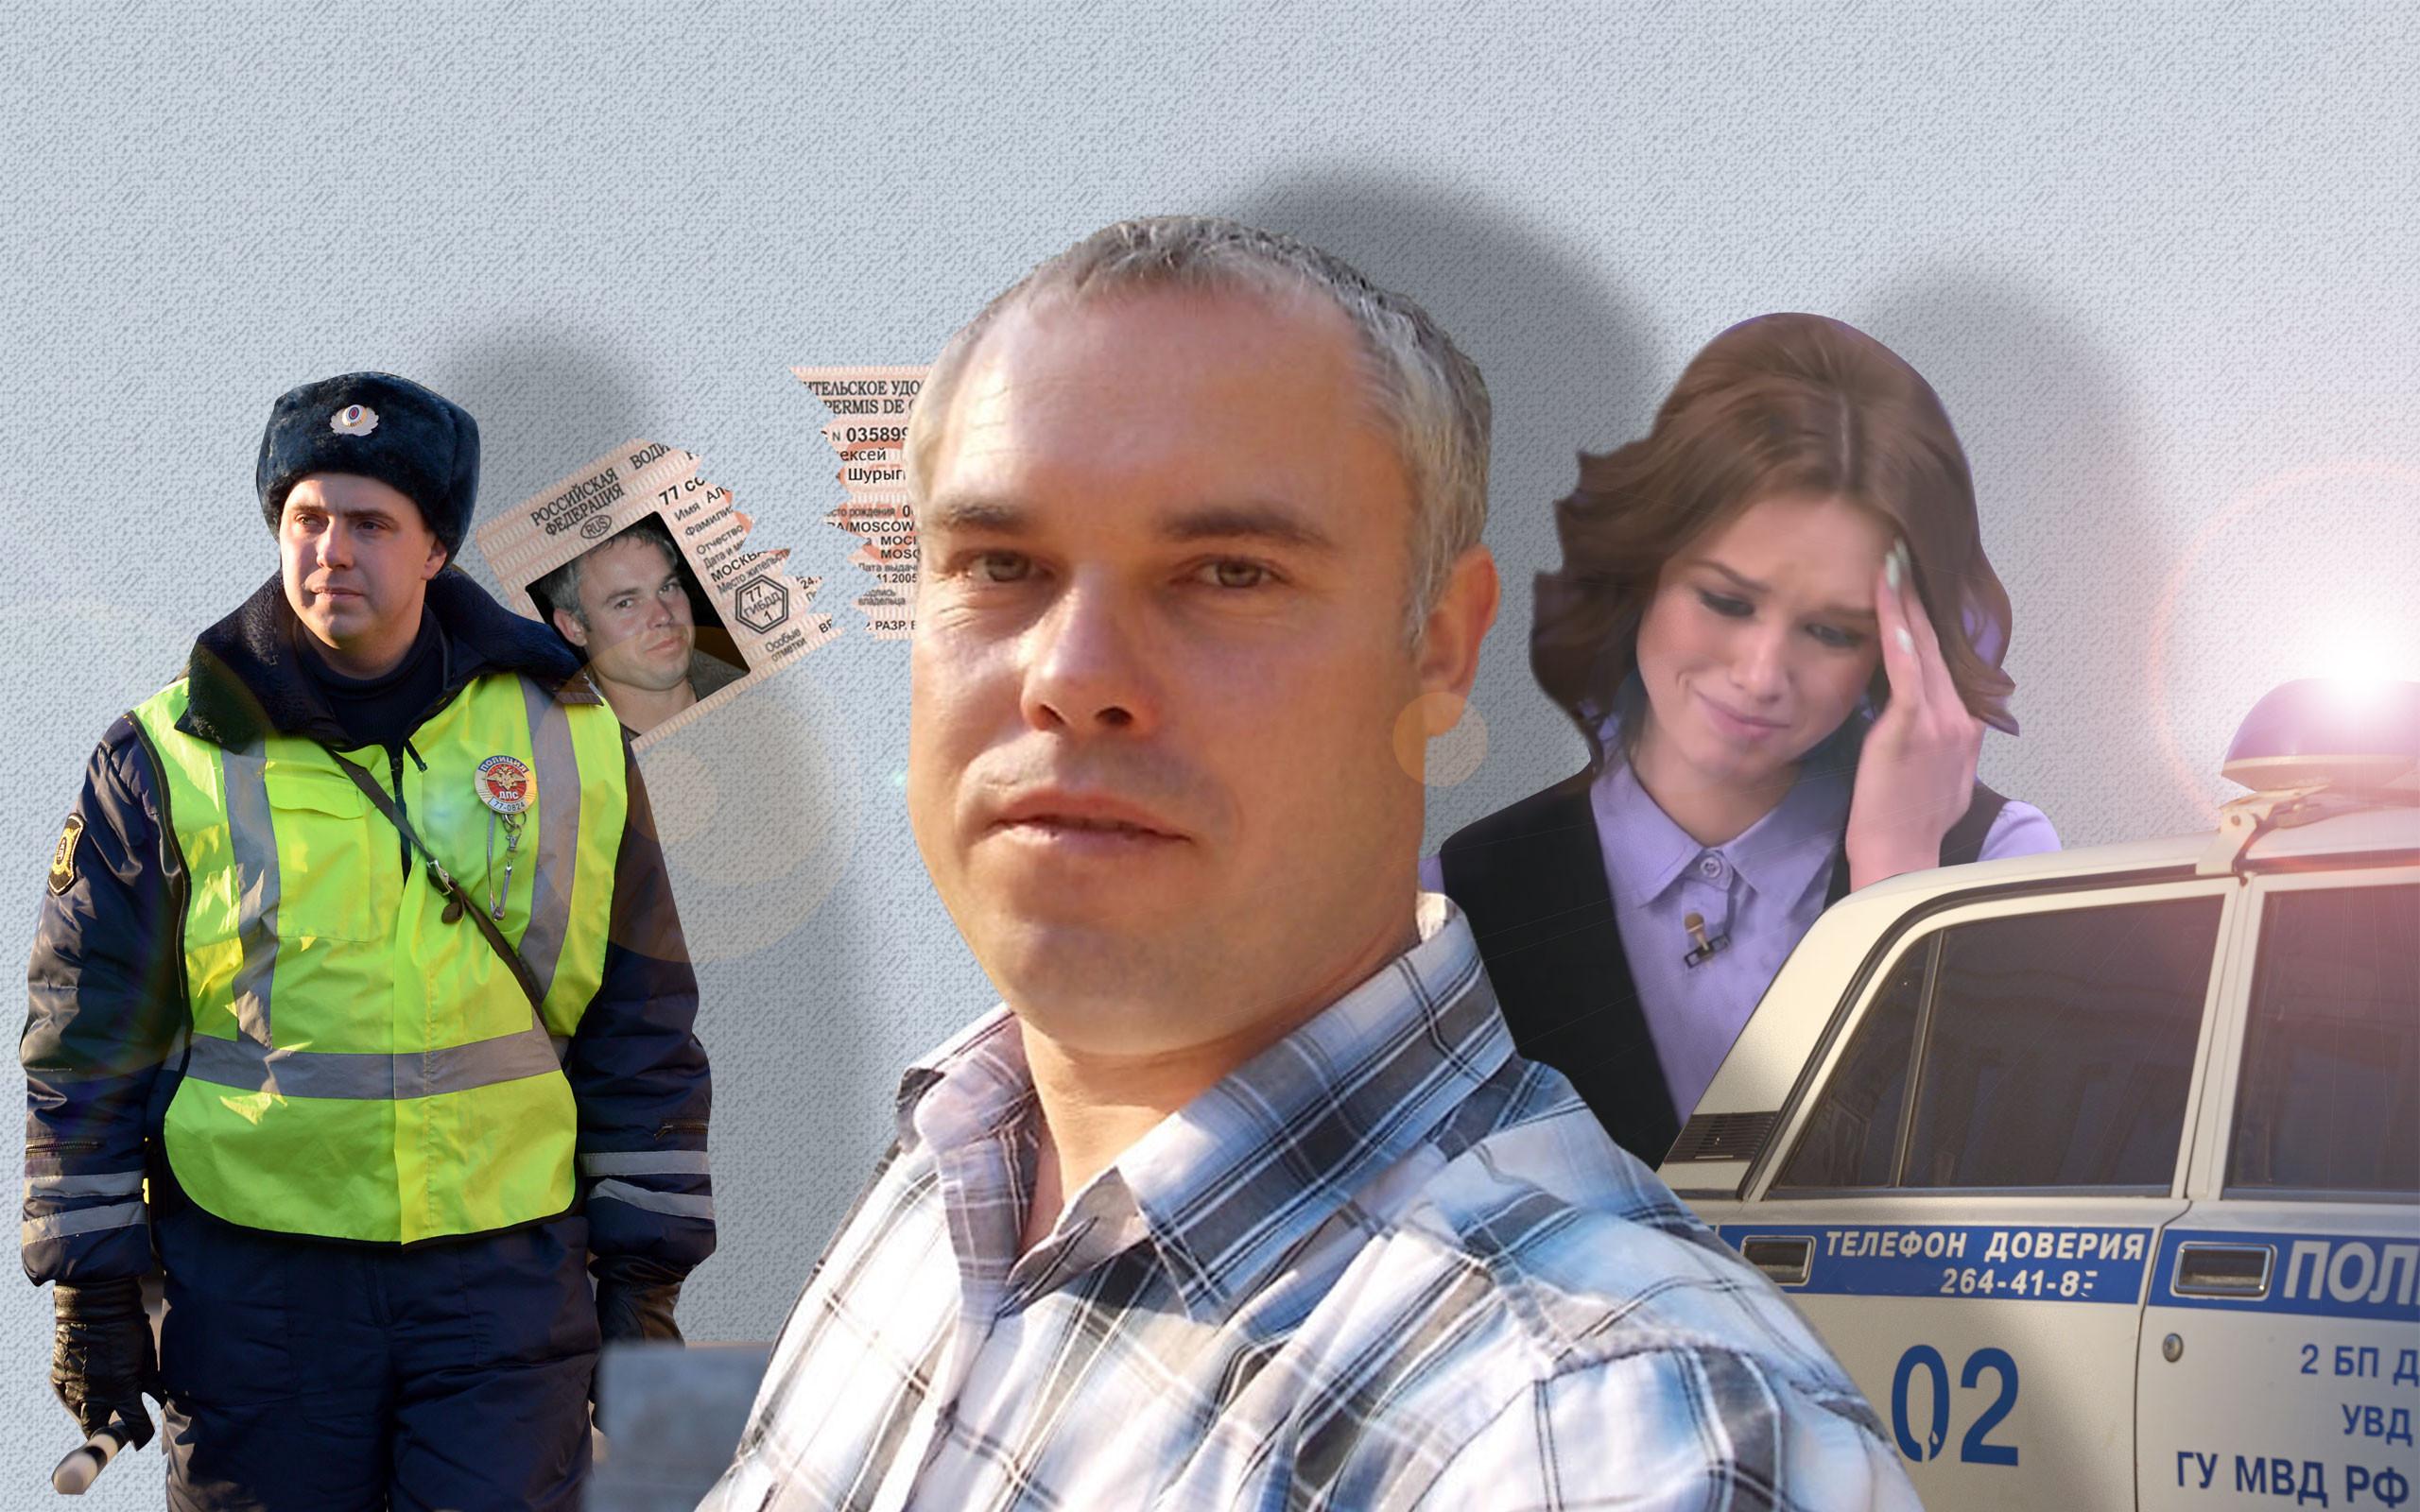 "<p>Коллаж. Фото: &copy; L!FE/Анна Исакова,&nbsp;кадр из телепередачи YouTube/<a href=""https://www.youtube.com/watch?v=OJHlhUXCsHg"" target=""_blank"">Пусть говорят</a>, Одноклассники<a href=""https://ok.ru/profile/472204183551/photos?st._aid=NavMenu_Friend_Photos"" target=""_blank"">/Алексей Шурыгин</a></p>"